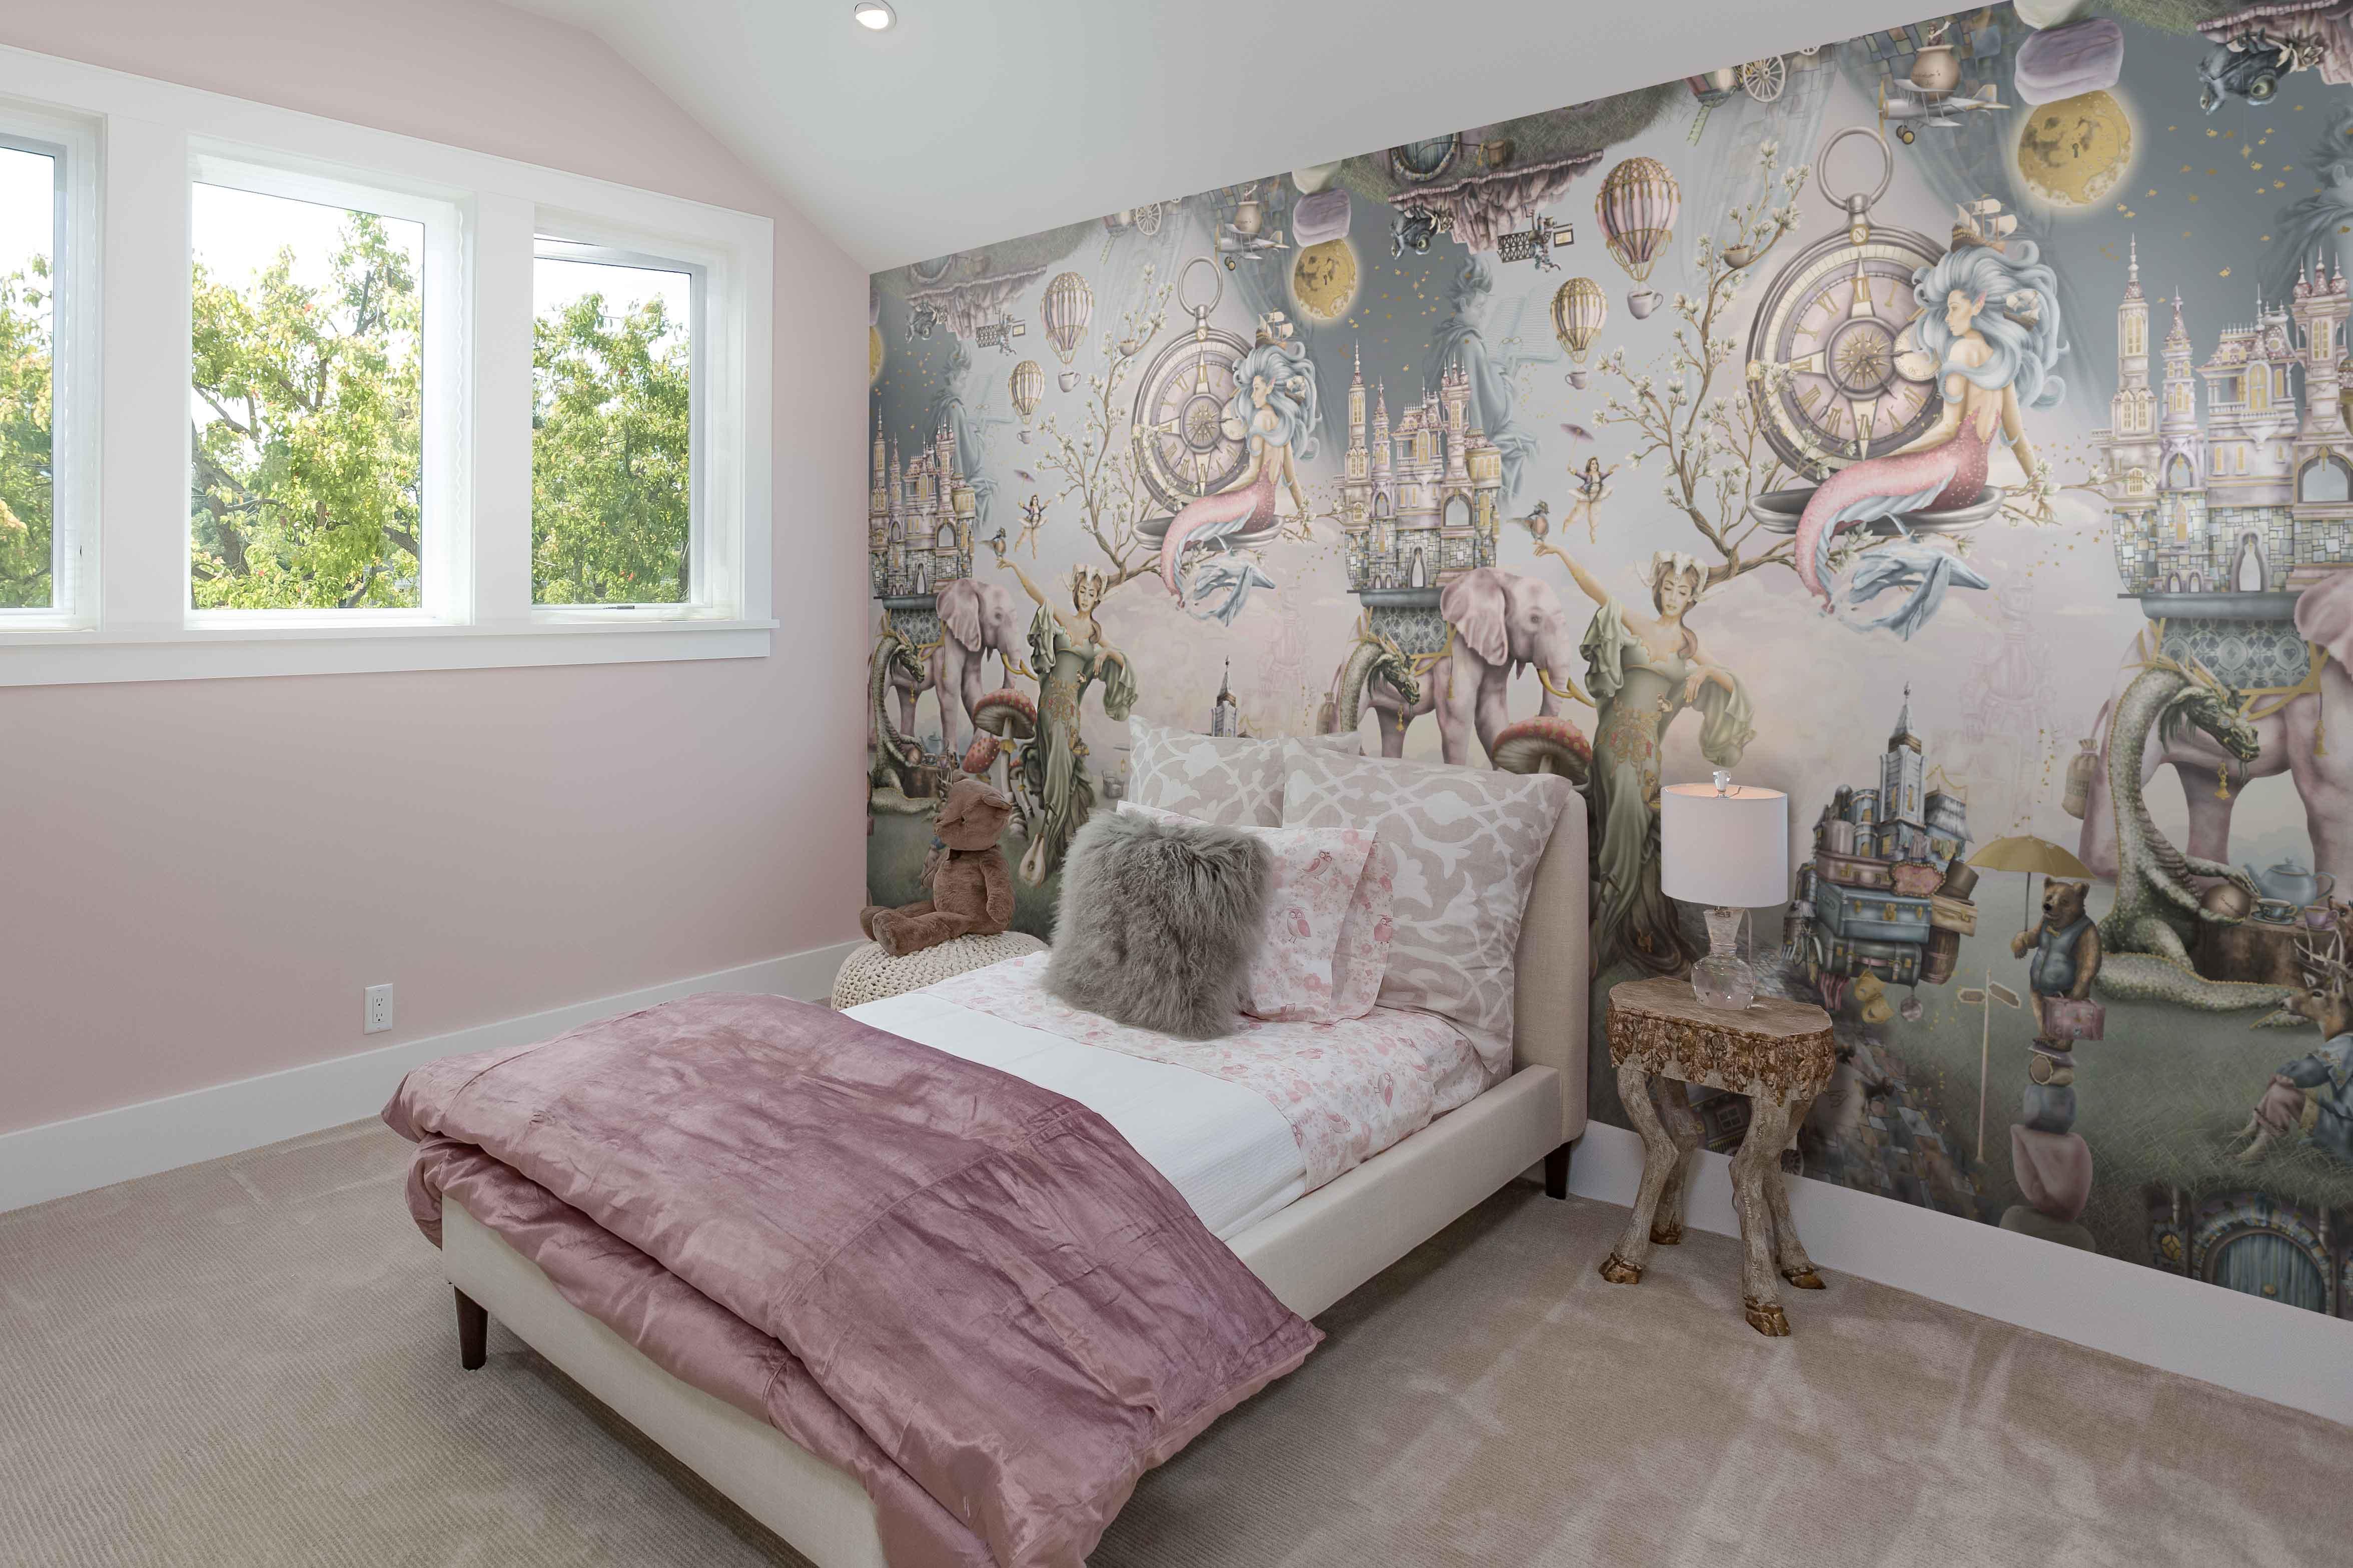 Custom fairytale wall mural wallpaper for a girls bedroom